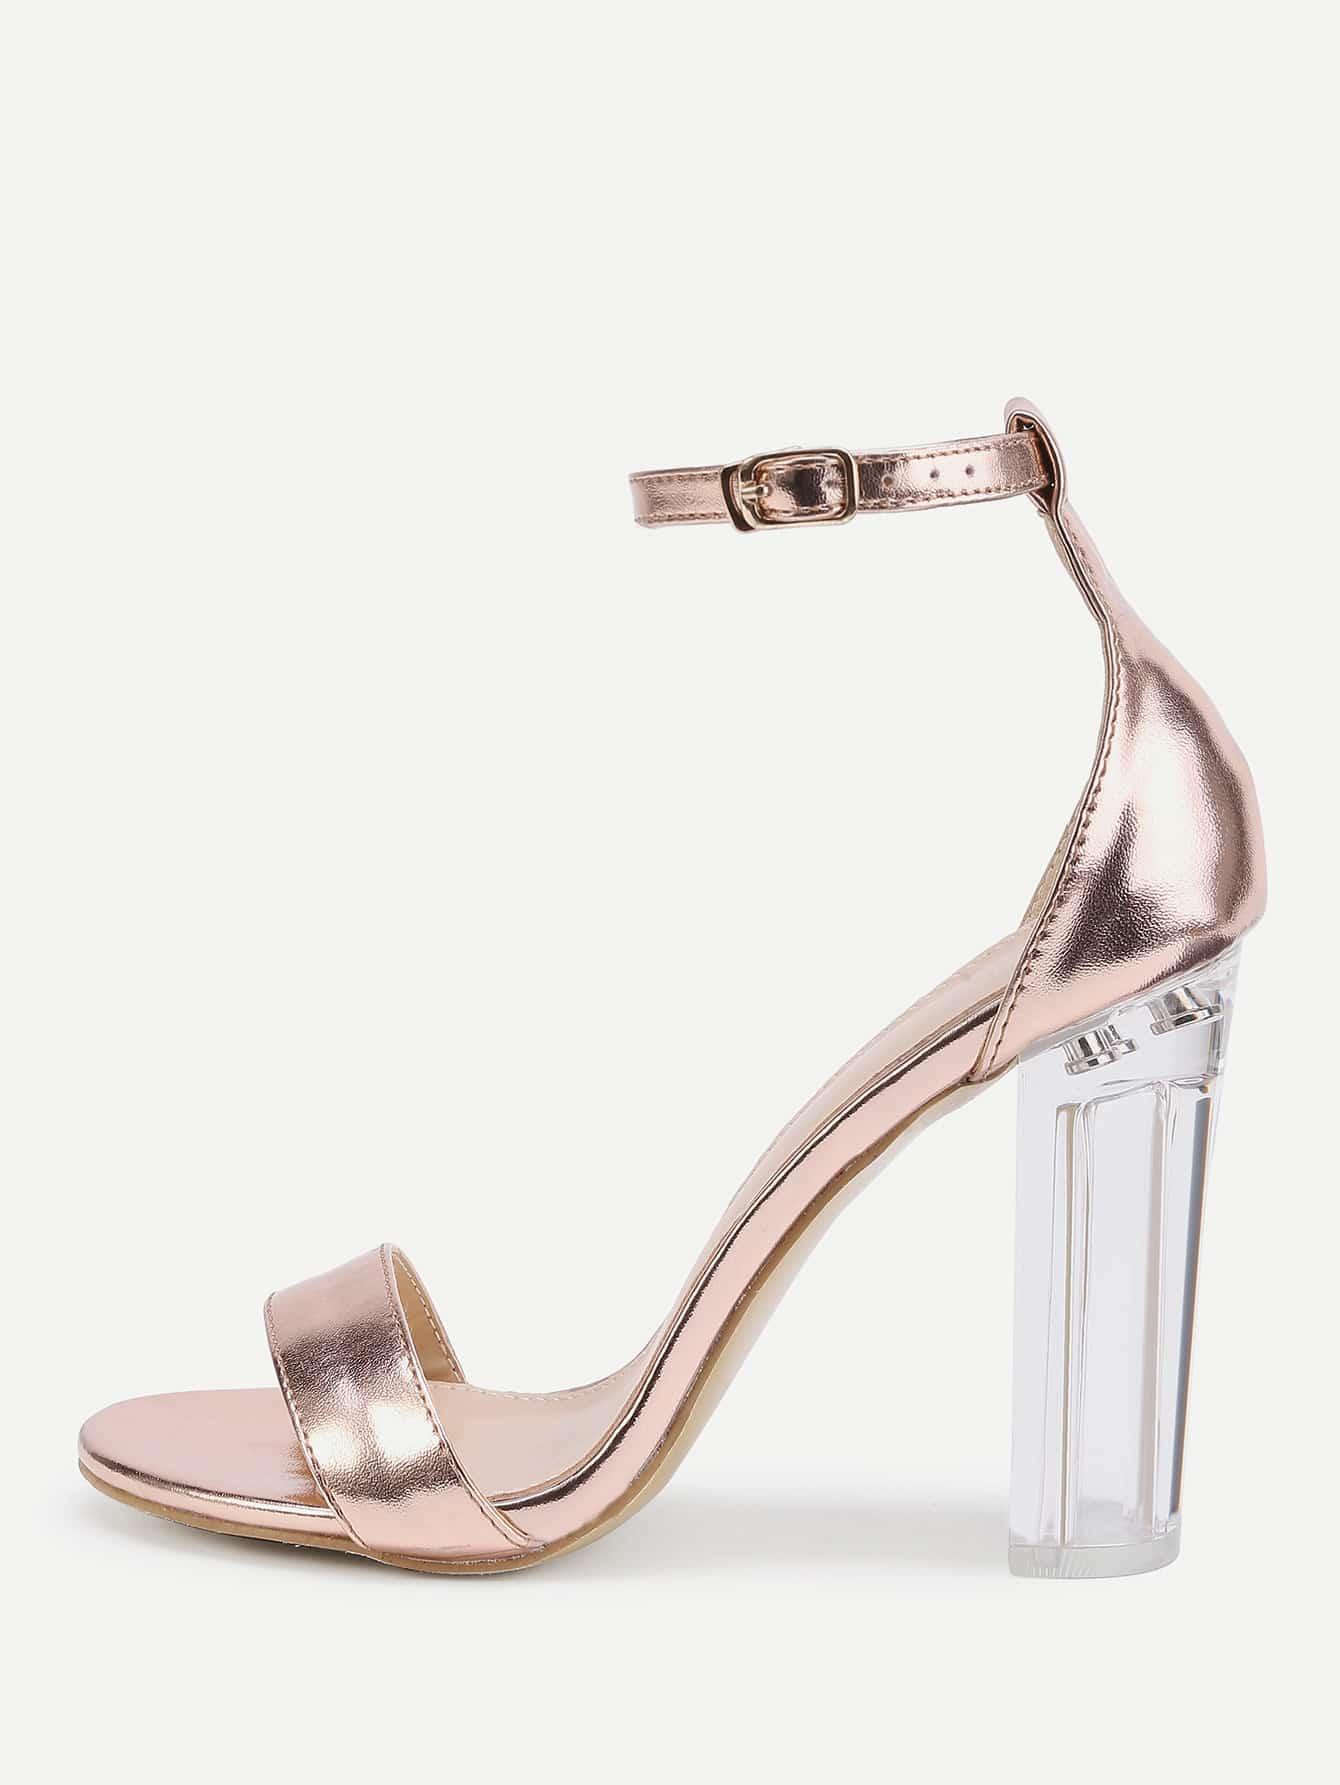 Rose Gold Lucite Heel Sandals shoes170404810